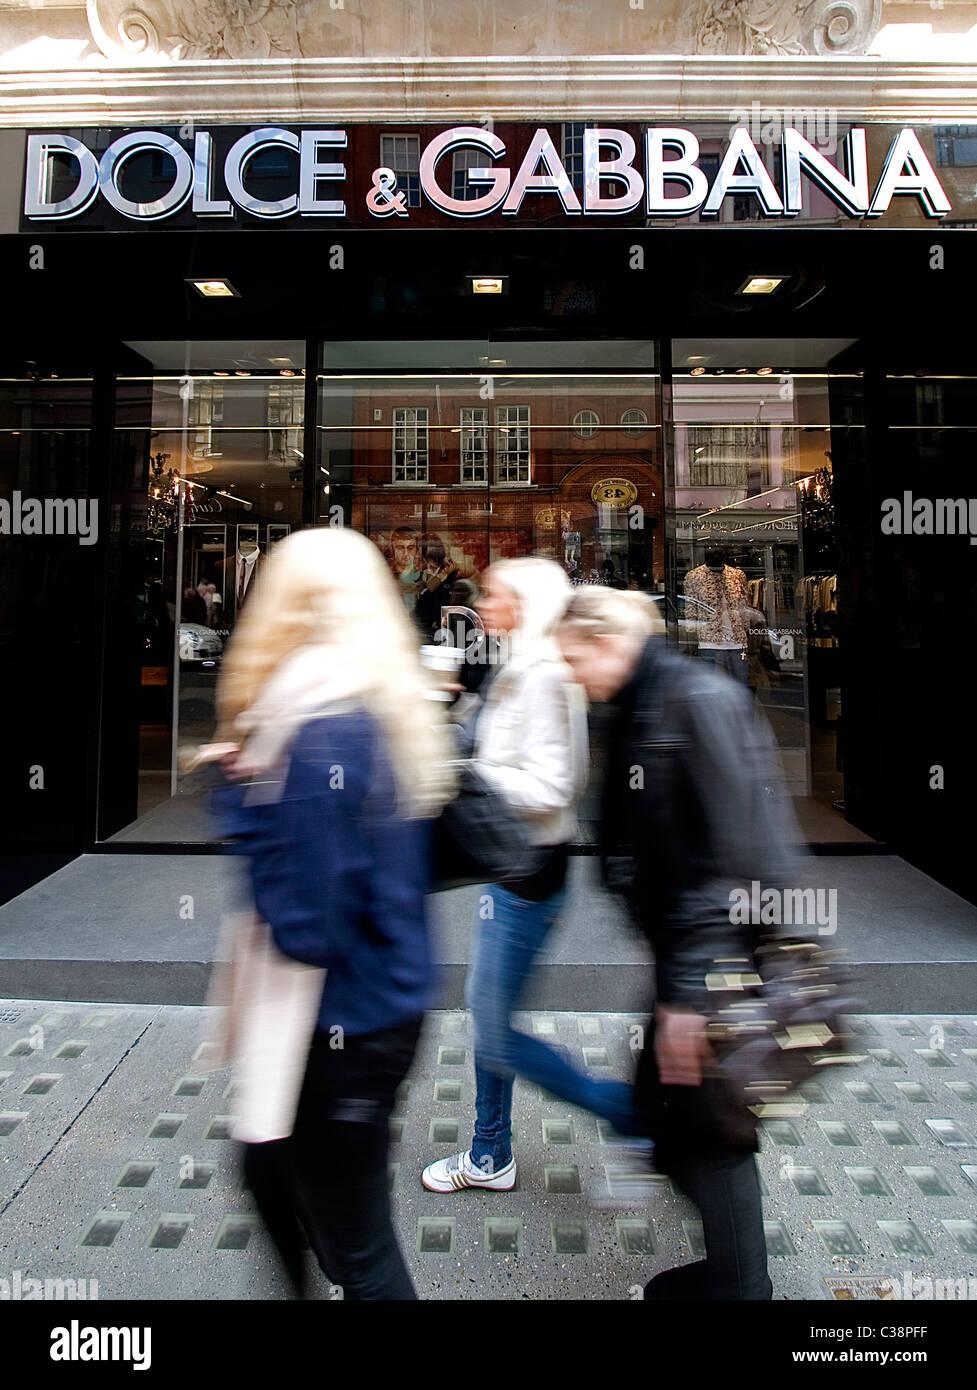 Außenaufnahme des Dolce & Gabana Store, Old Bond Street, London. Stockbild